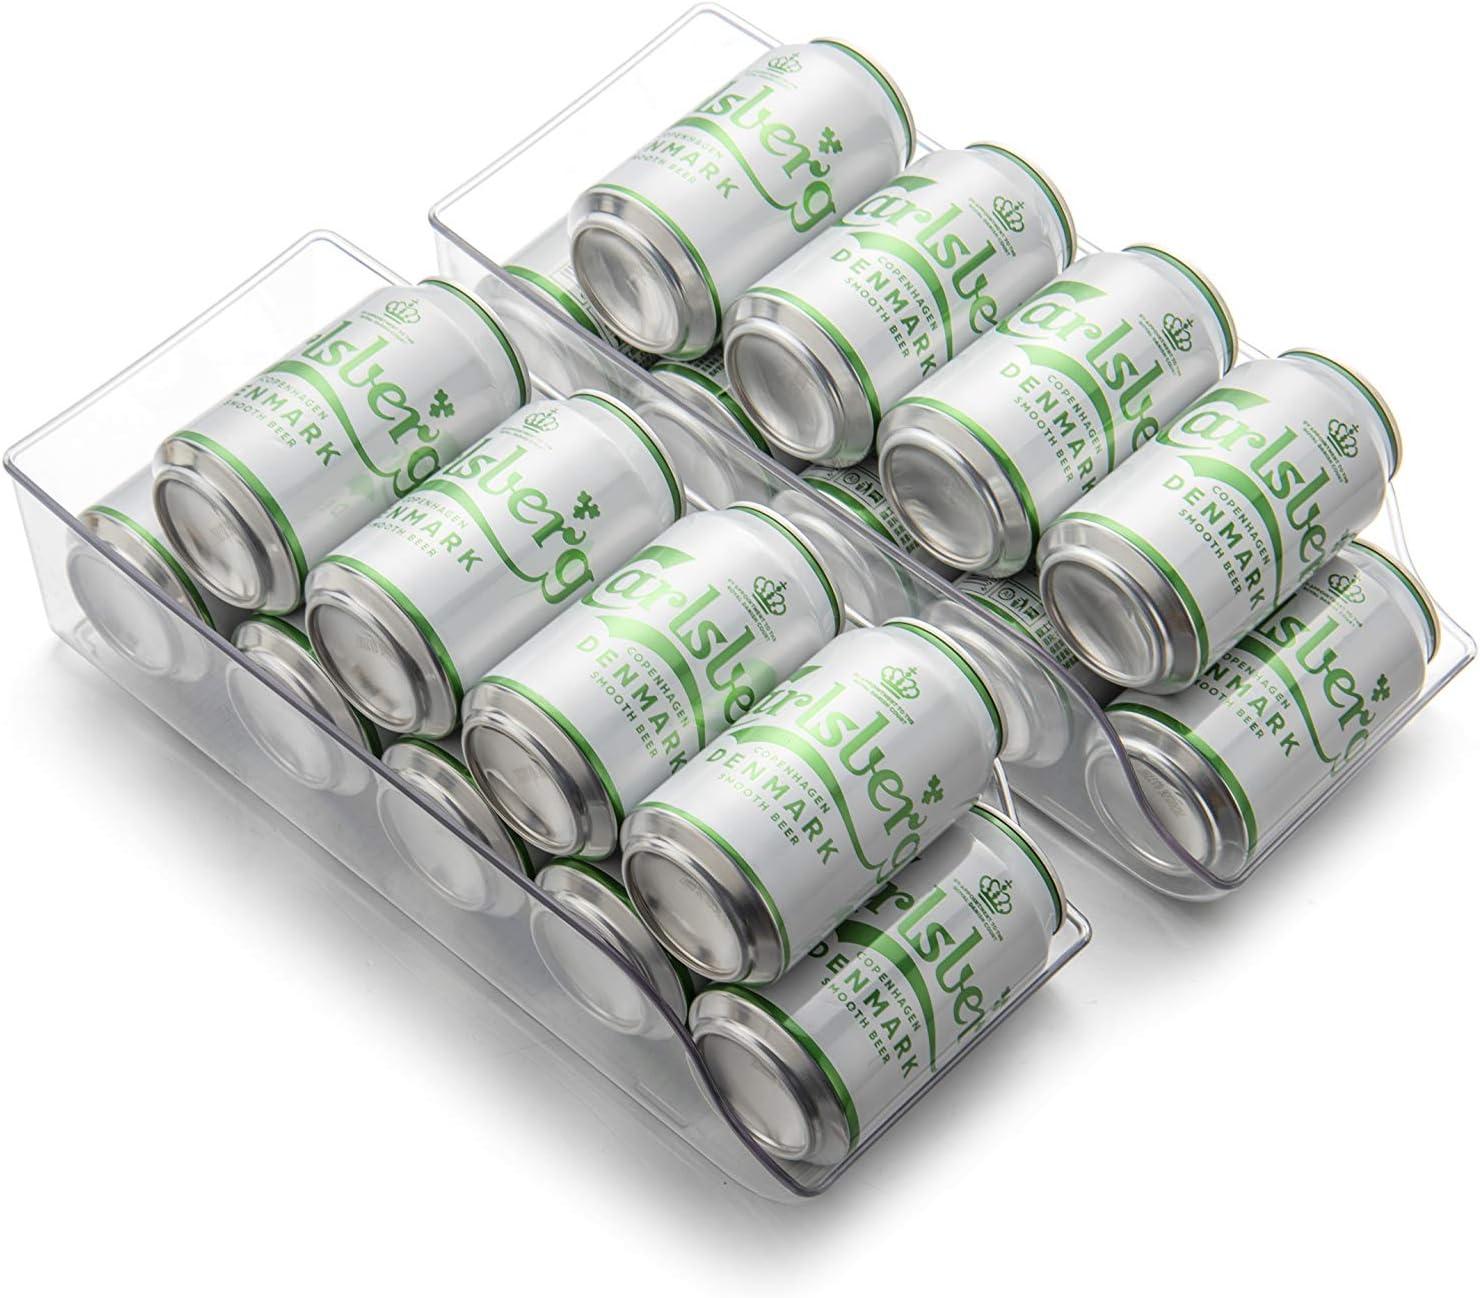 Set of 2 JINAMART Refrigerator Organizer Bins Pop Soda Can Dispenser Beverage Holder for Fridge, Freezer, Kitchen, Countertops, Cabinets - Clear Plastic Canned Food Pantry Storage Rack (2 PCS)